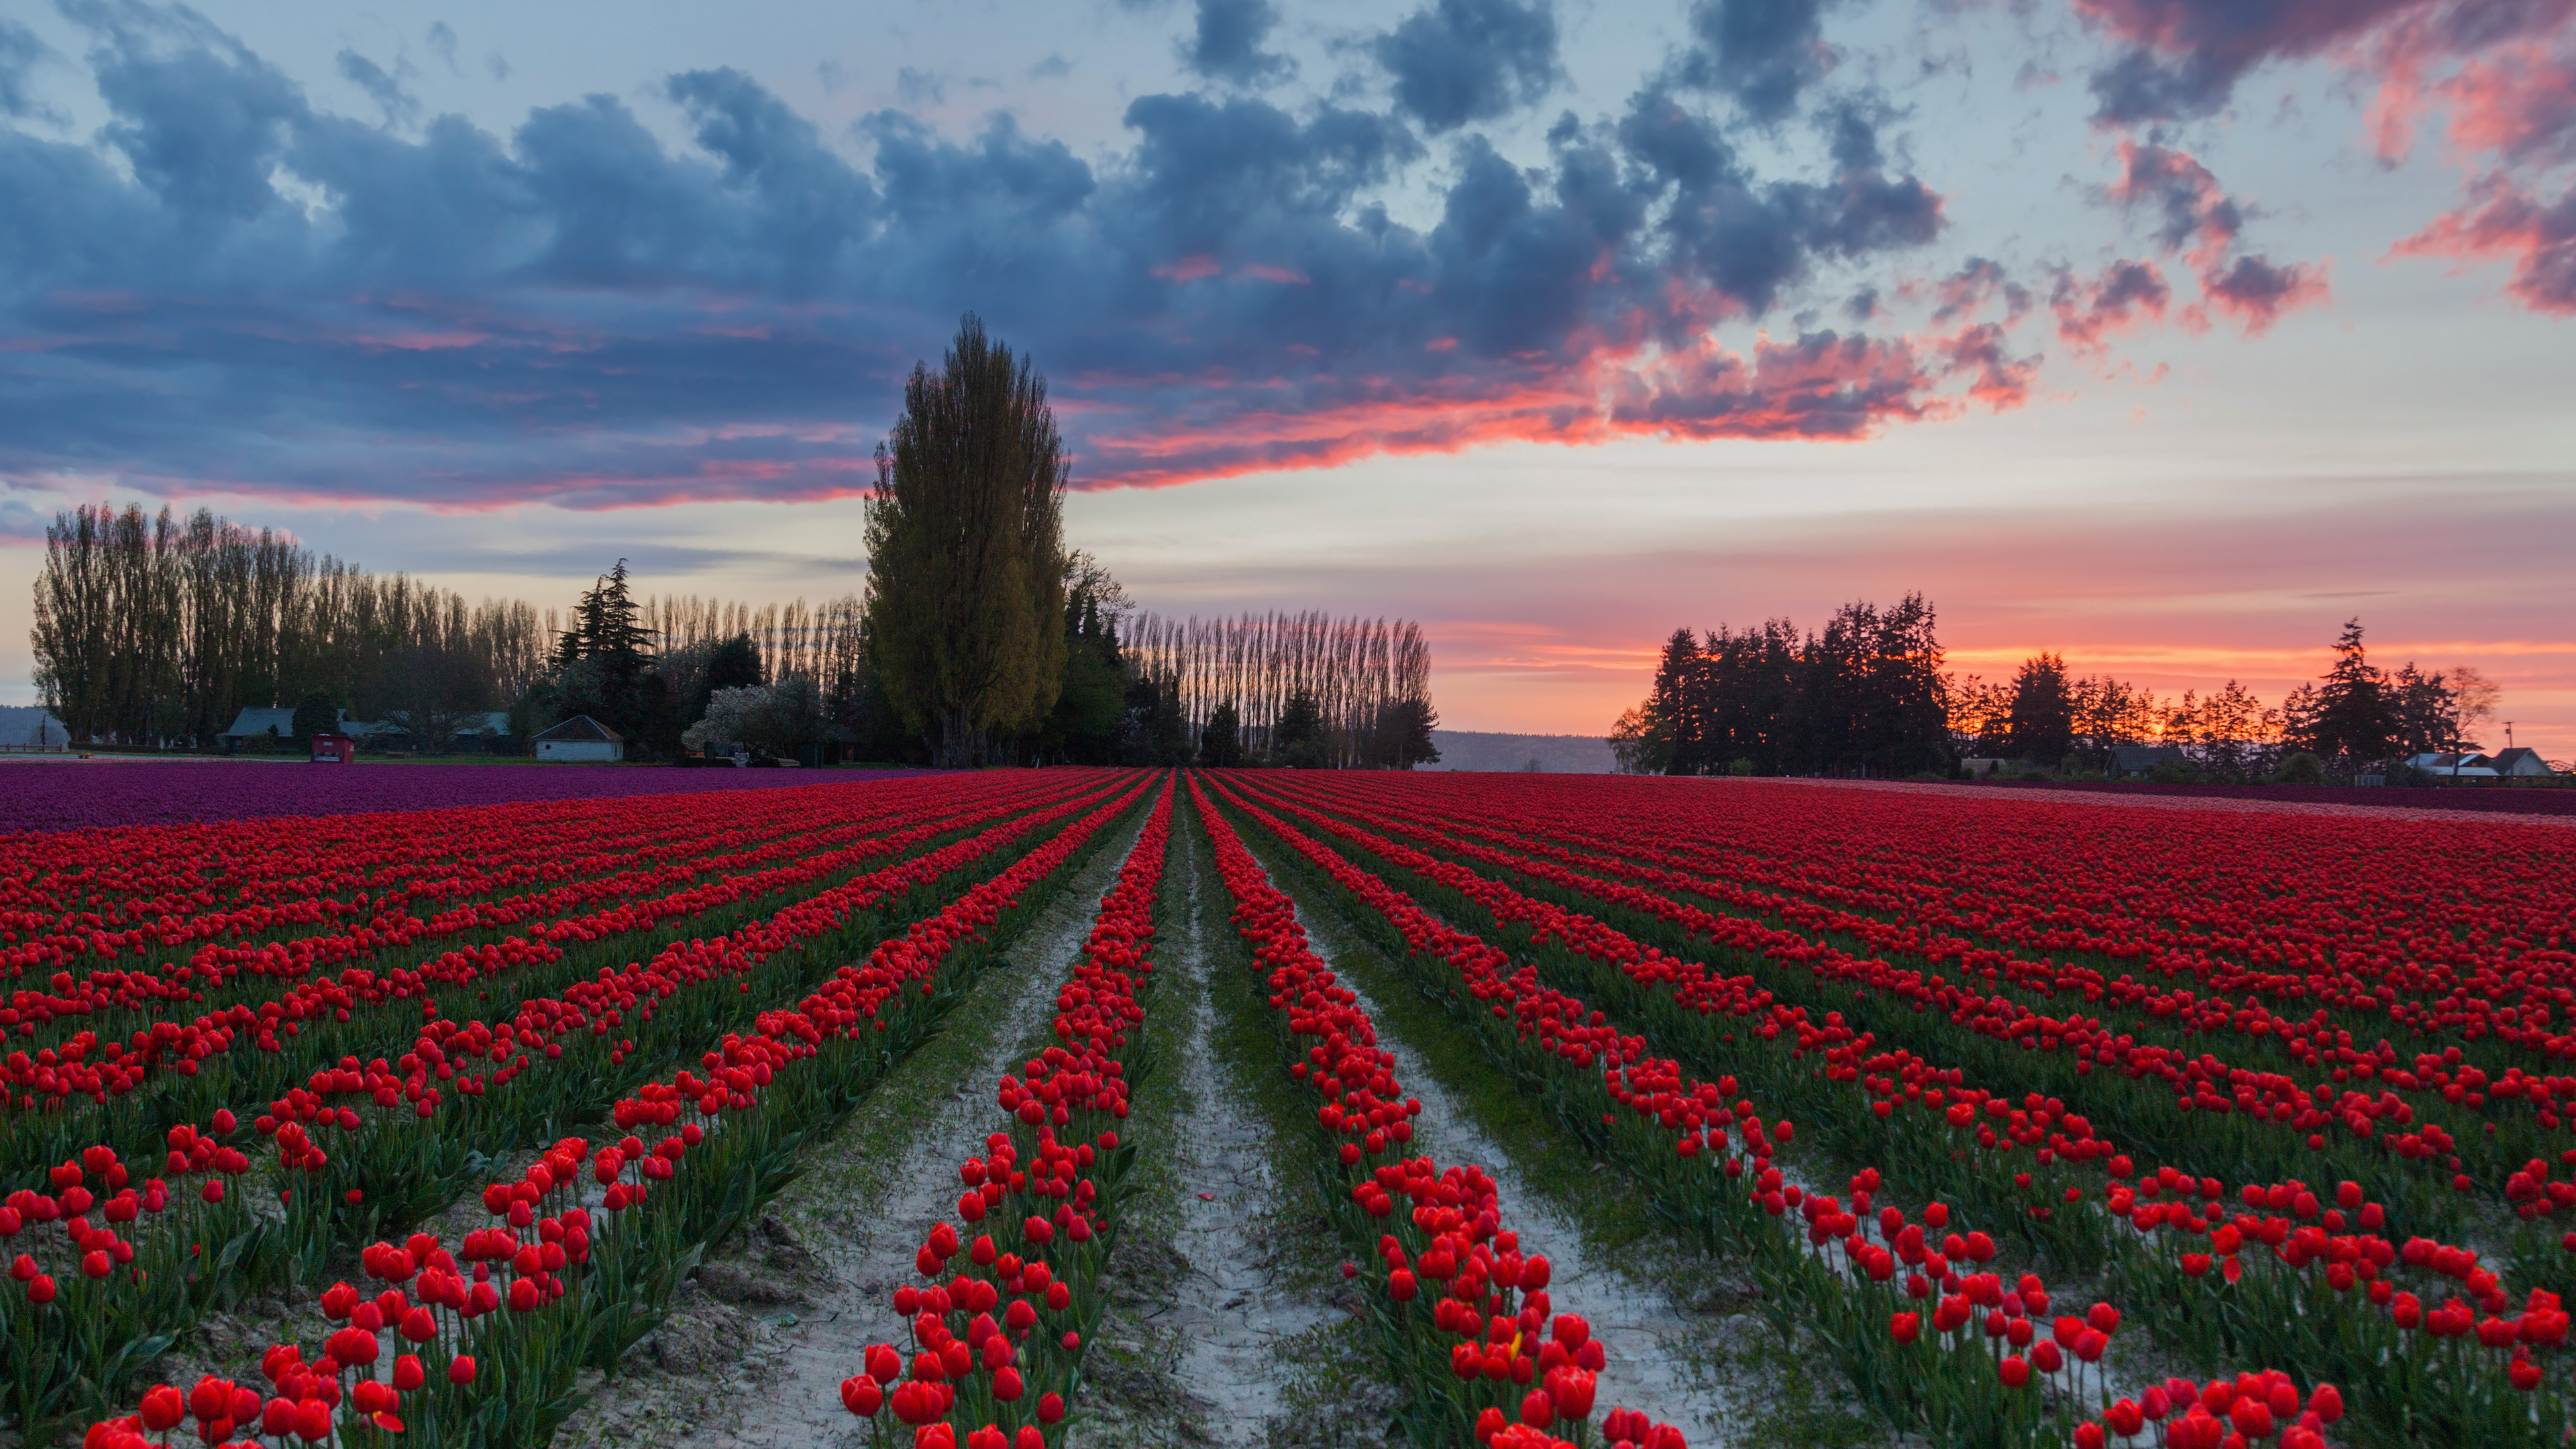 in the Tulip Fields Skagit Valley WA [3840x2160] iimgurcom 3840x2160